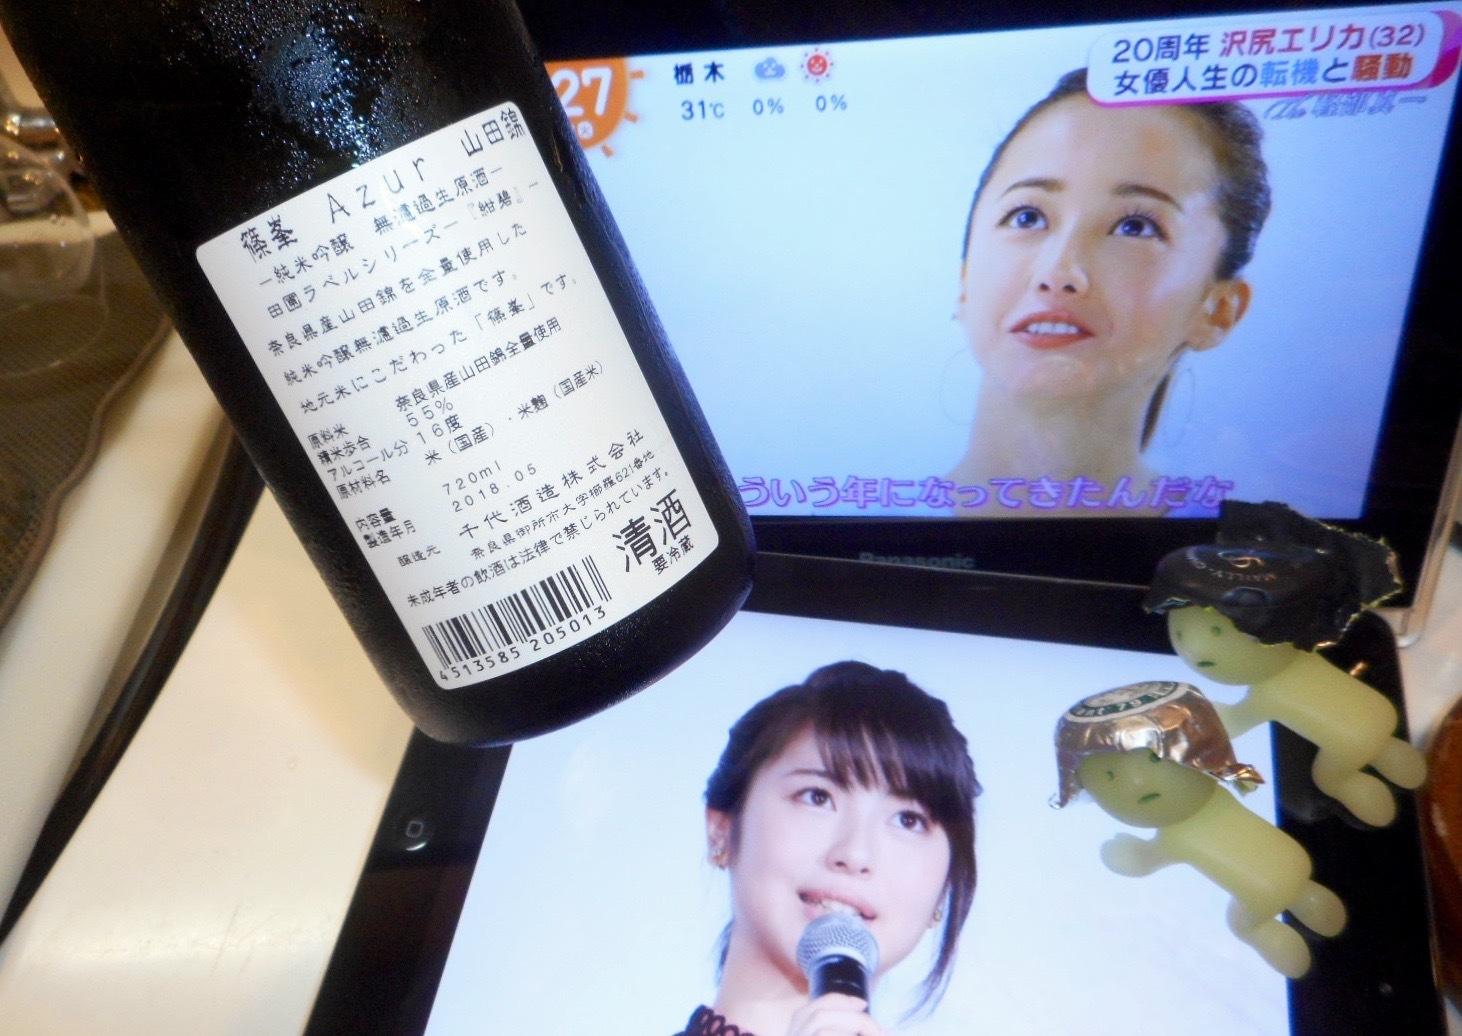 浜辺美波最強論vs沢尻エリカ3